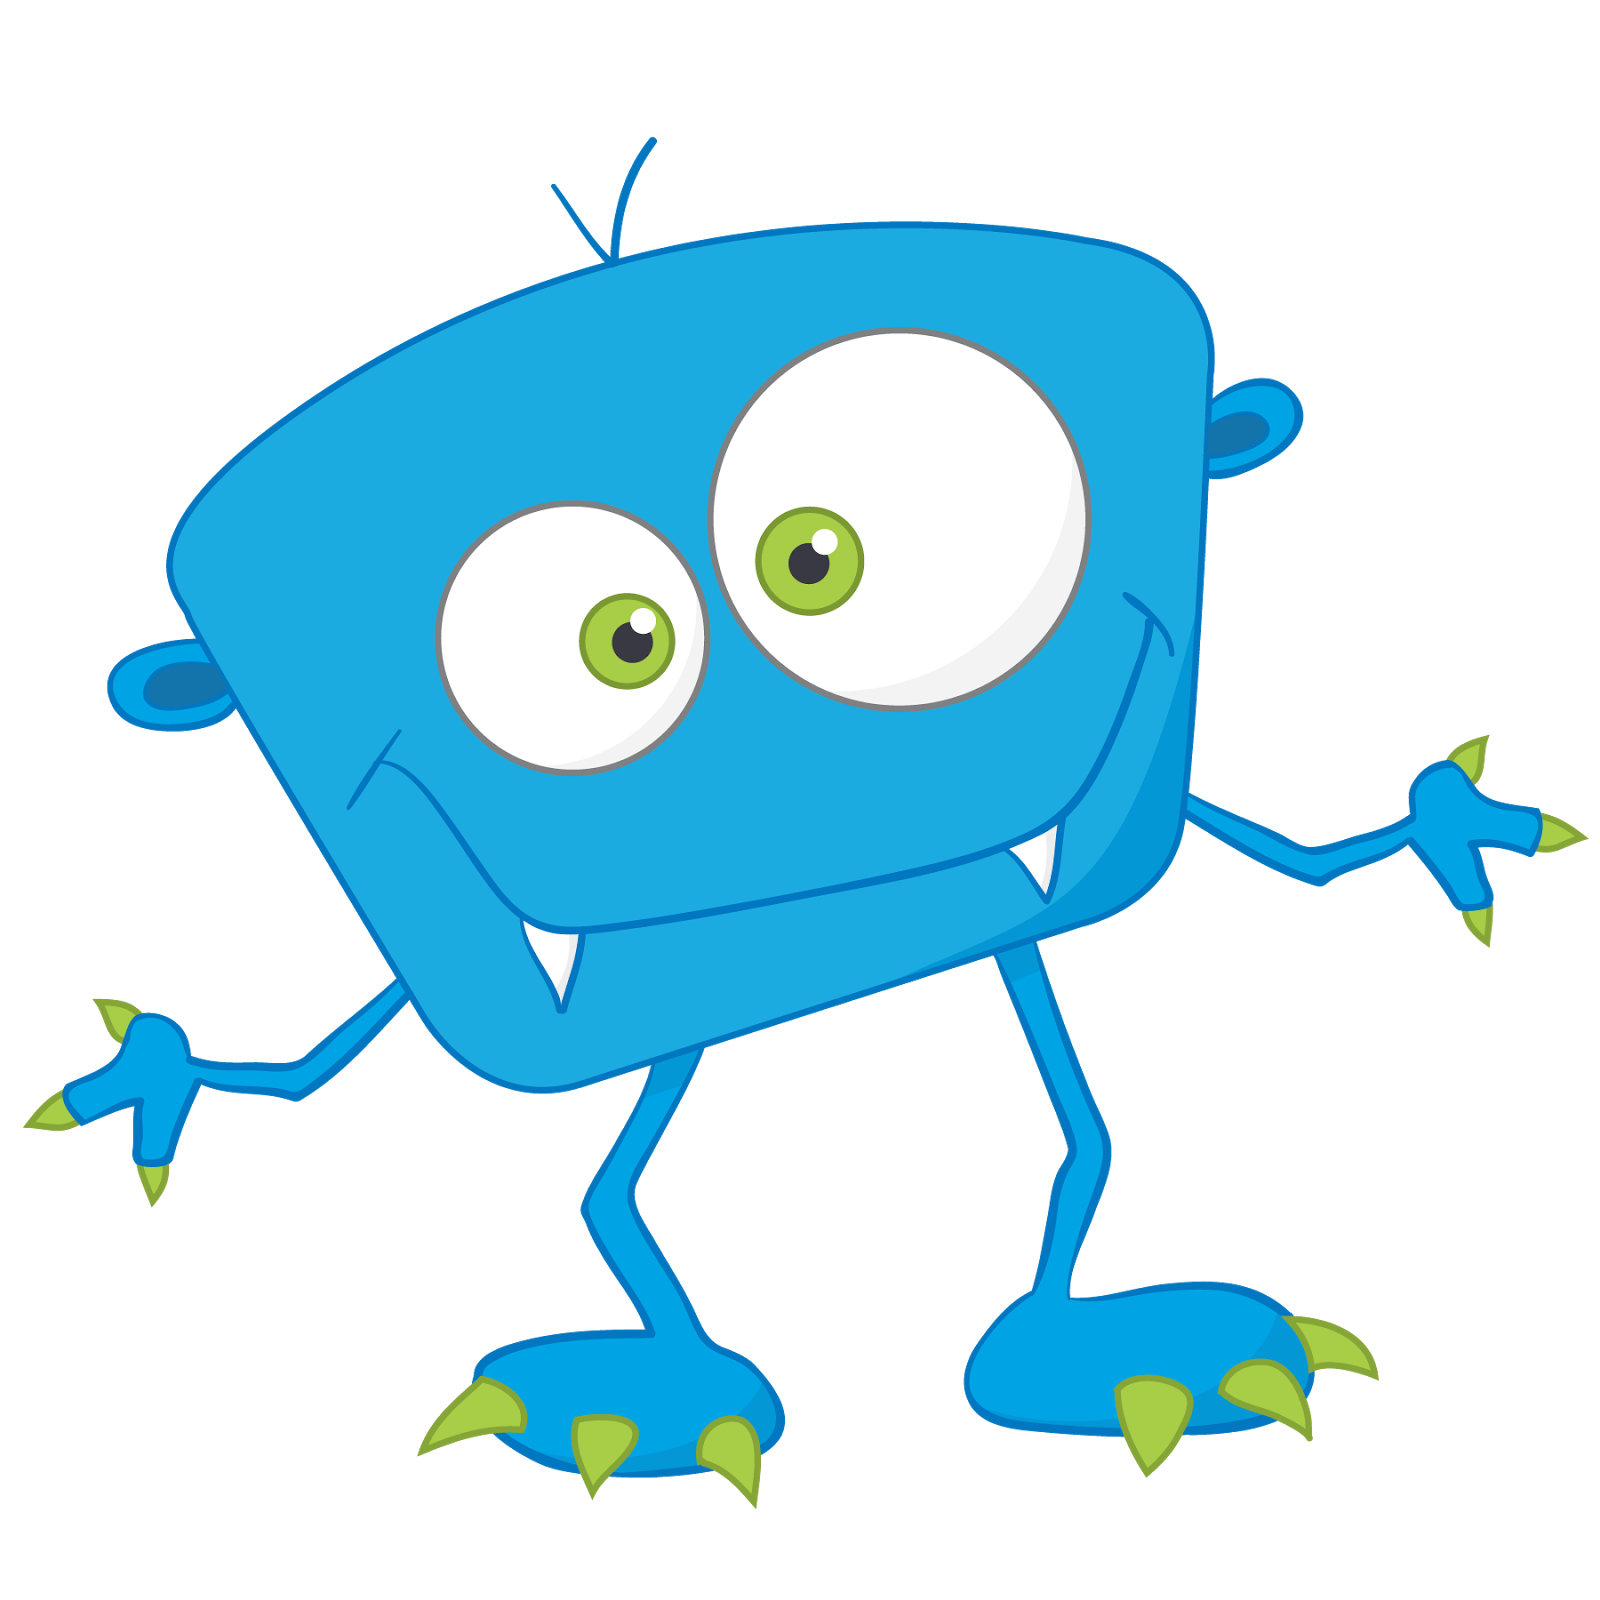 cute monster clipart at getdrawings com free for personal use cute rh getdrawings com cute monster clip art cute monster clipart